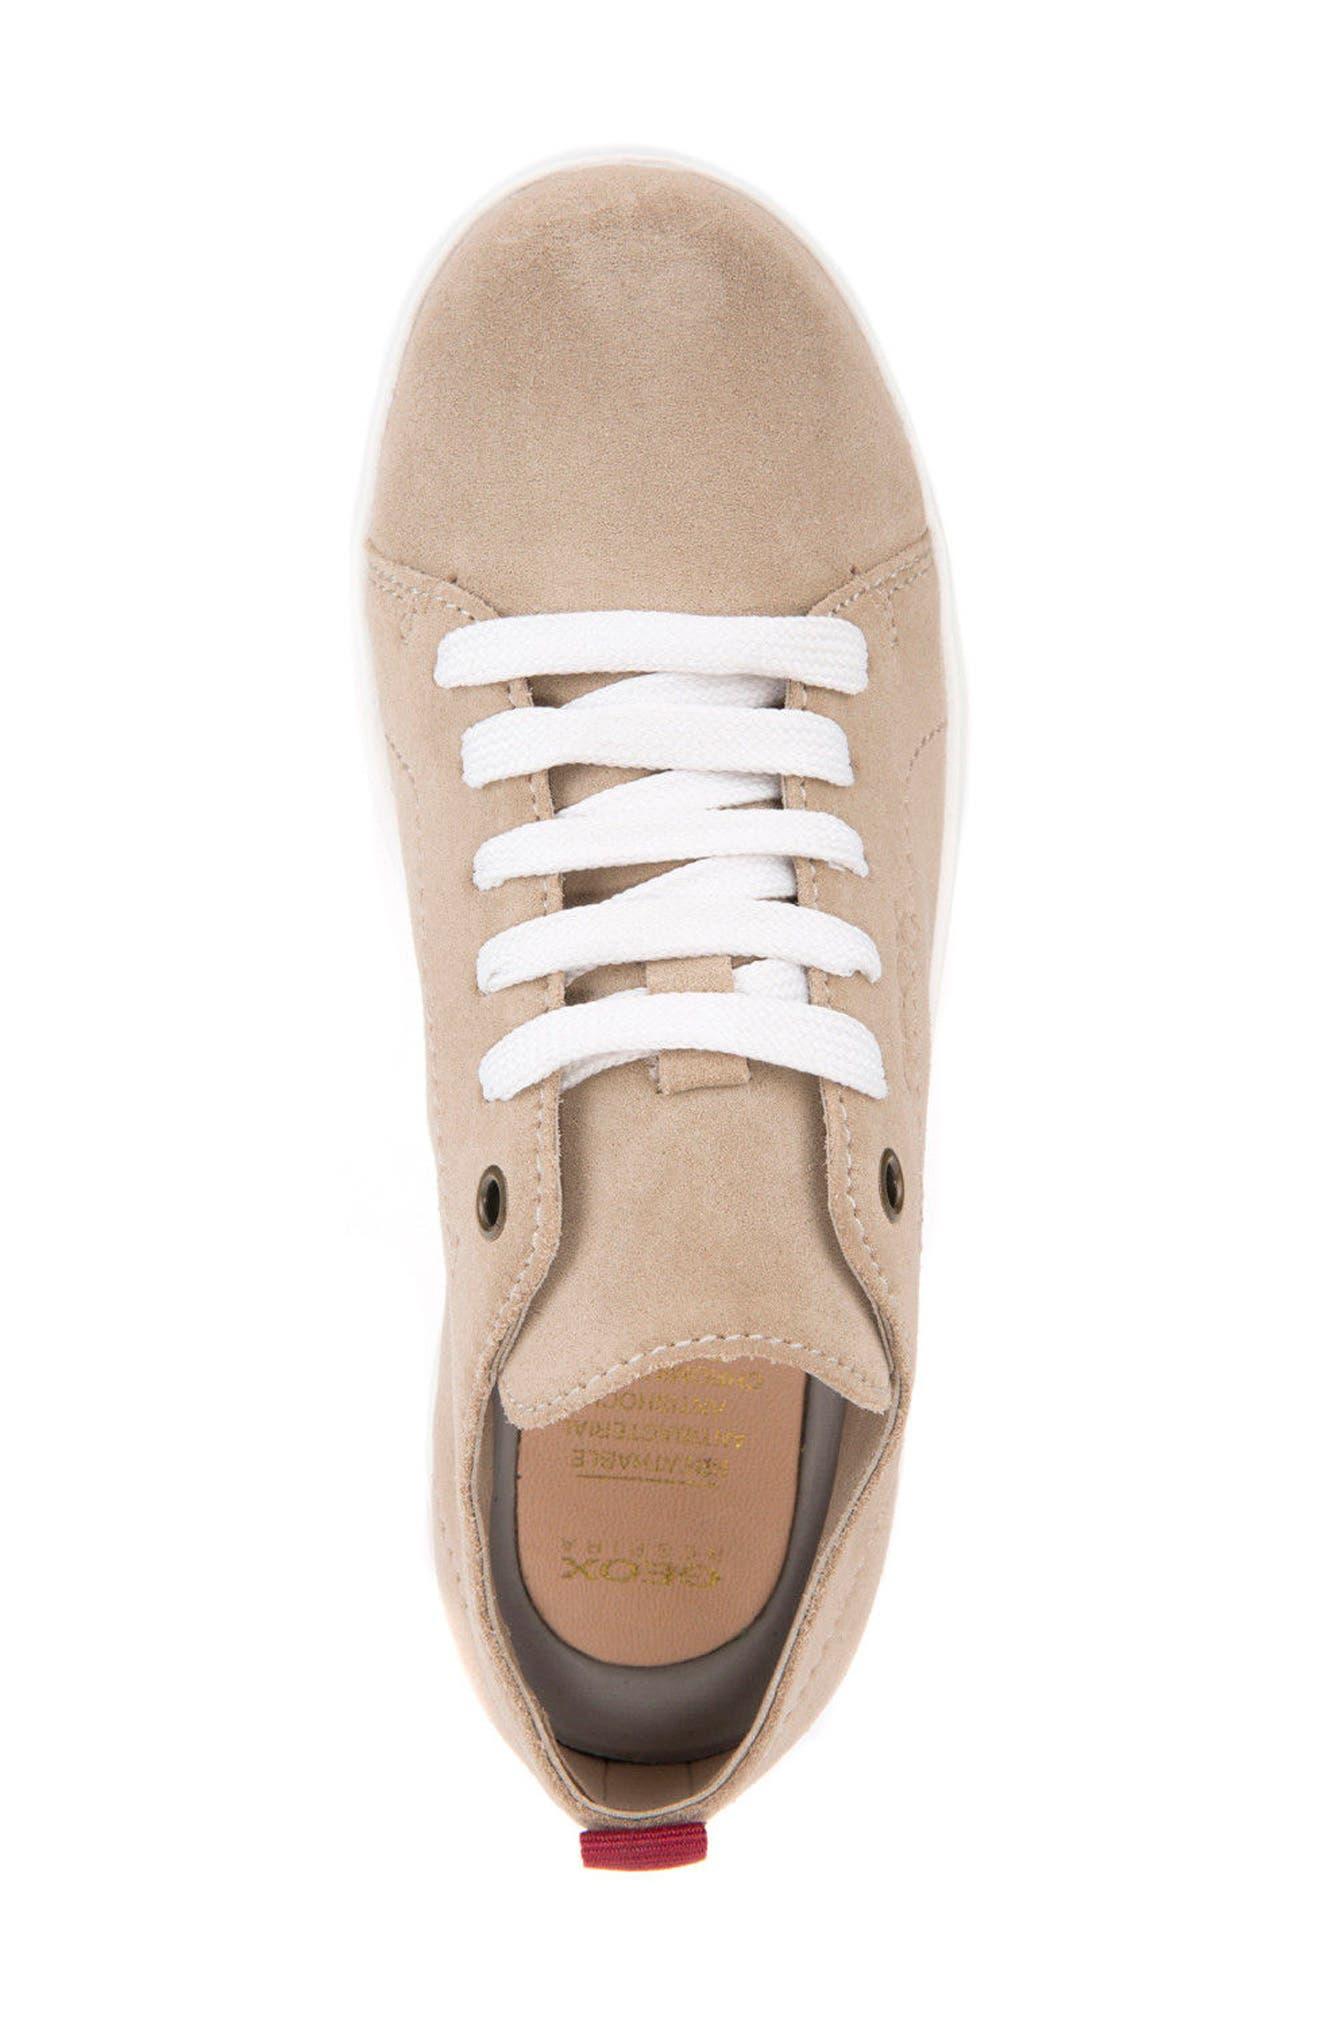 Anthor Low Top Sneaker,                             Alternate thumbnail 5, color,                             BEIGE